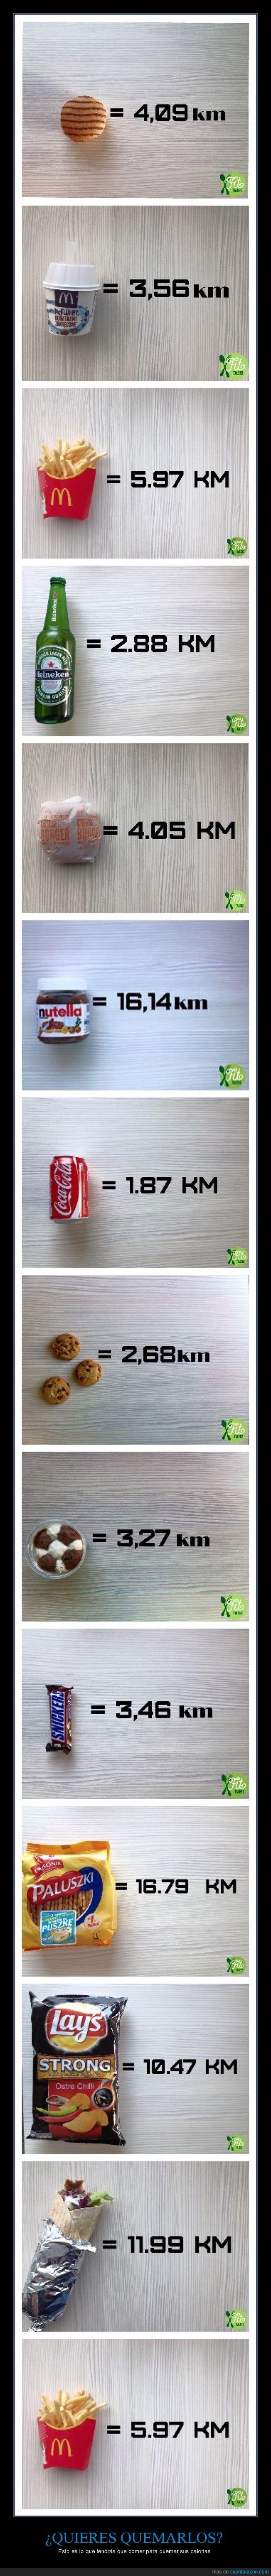 comida,correr,deporte,dieta,kebab,kilometro,nutella,nutrición,pastel,patatas